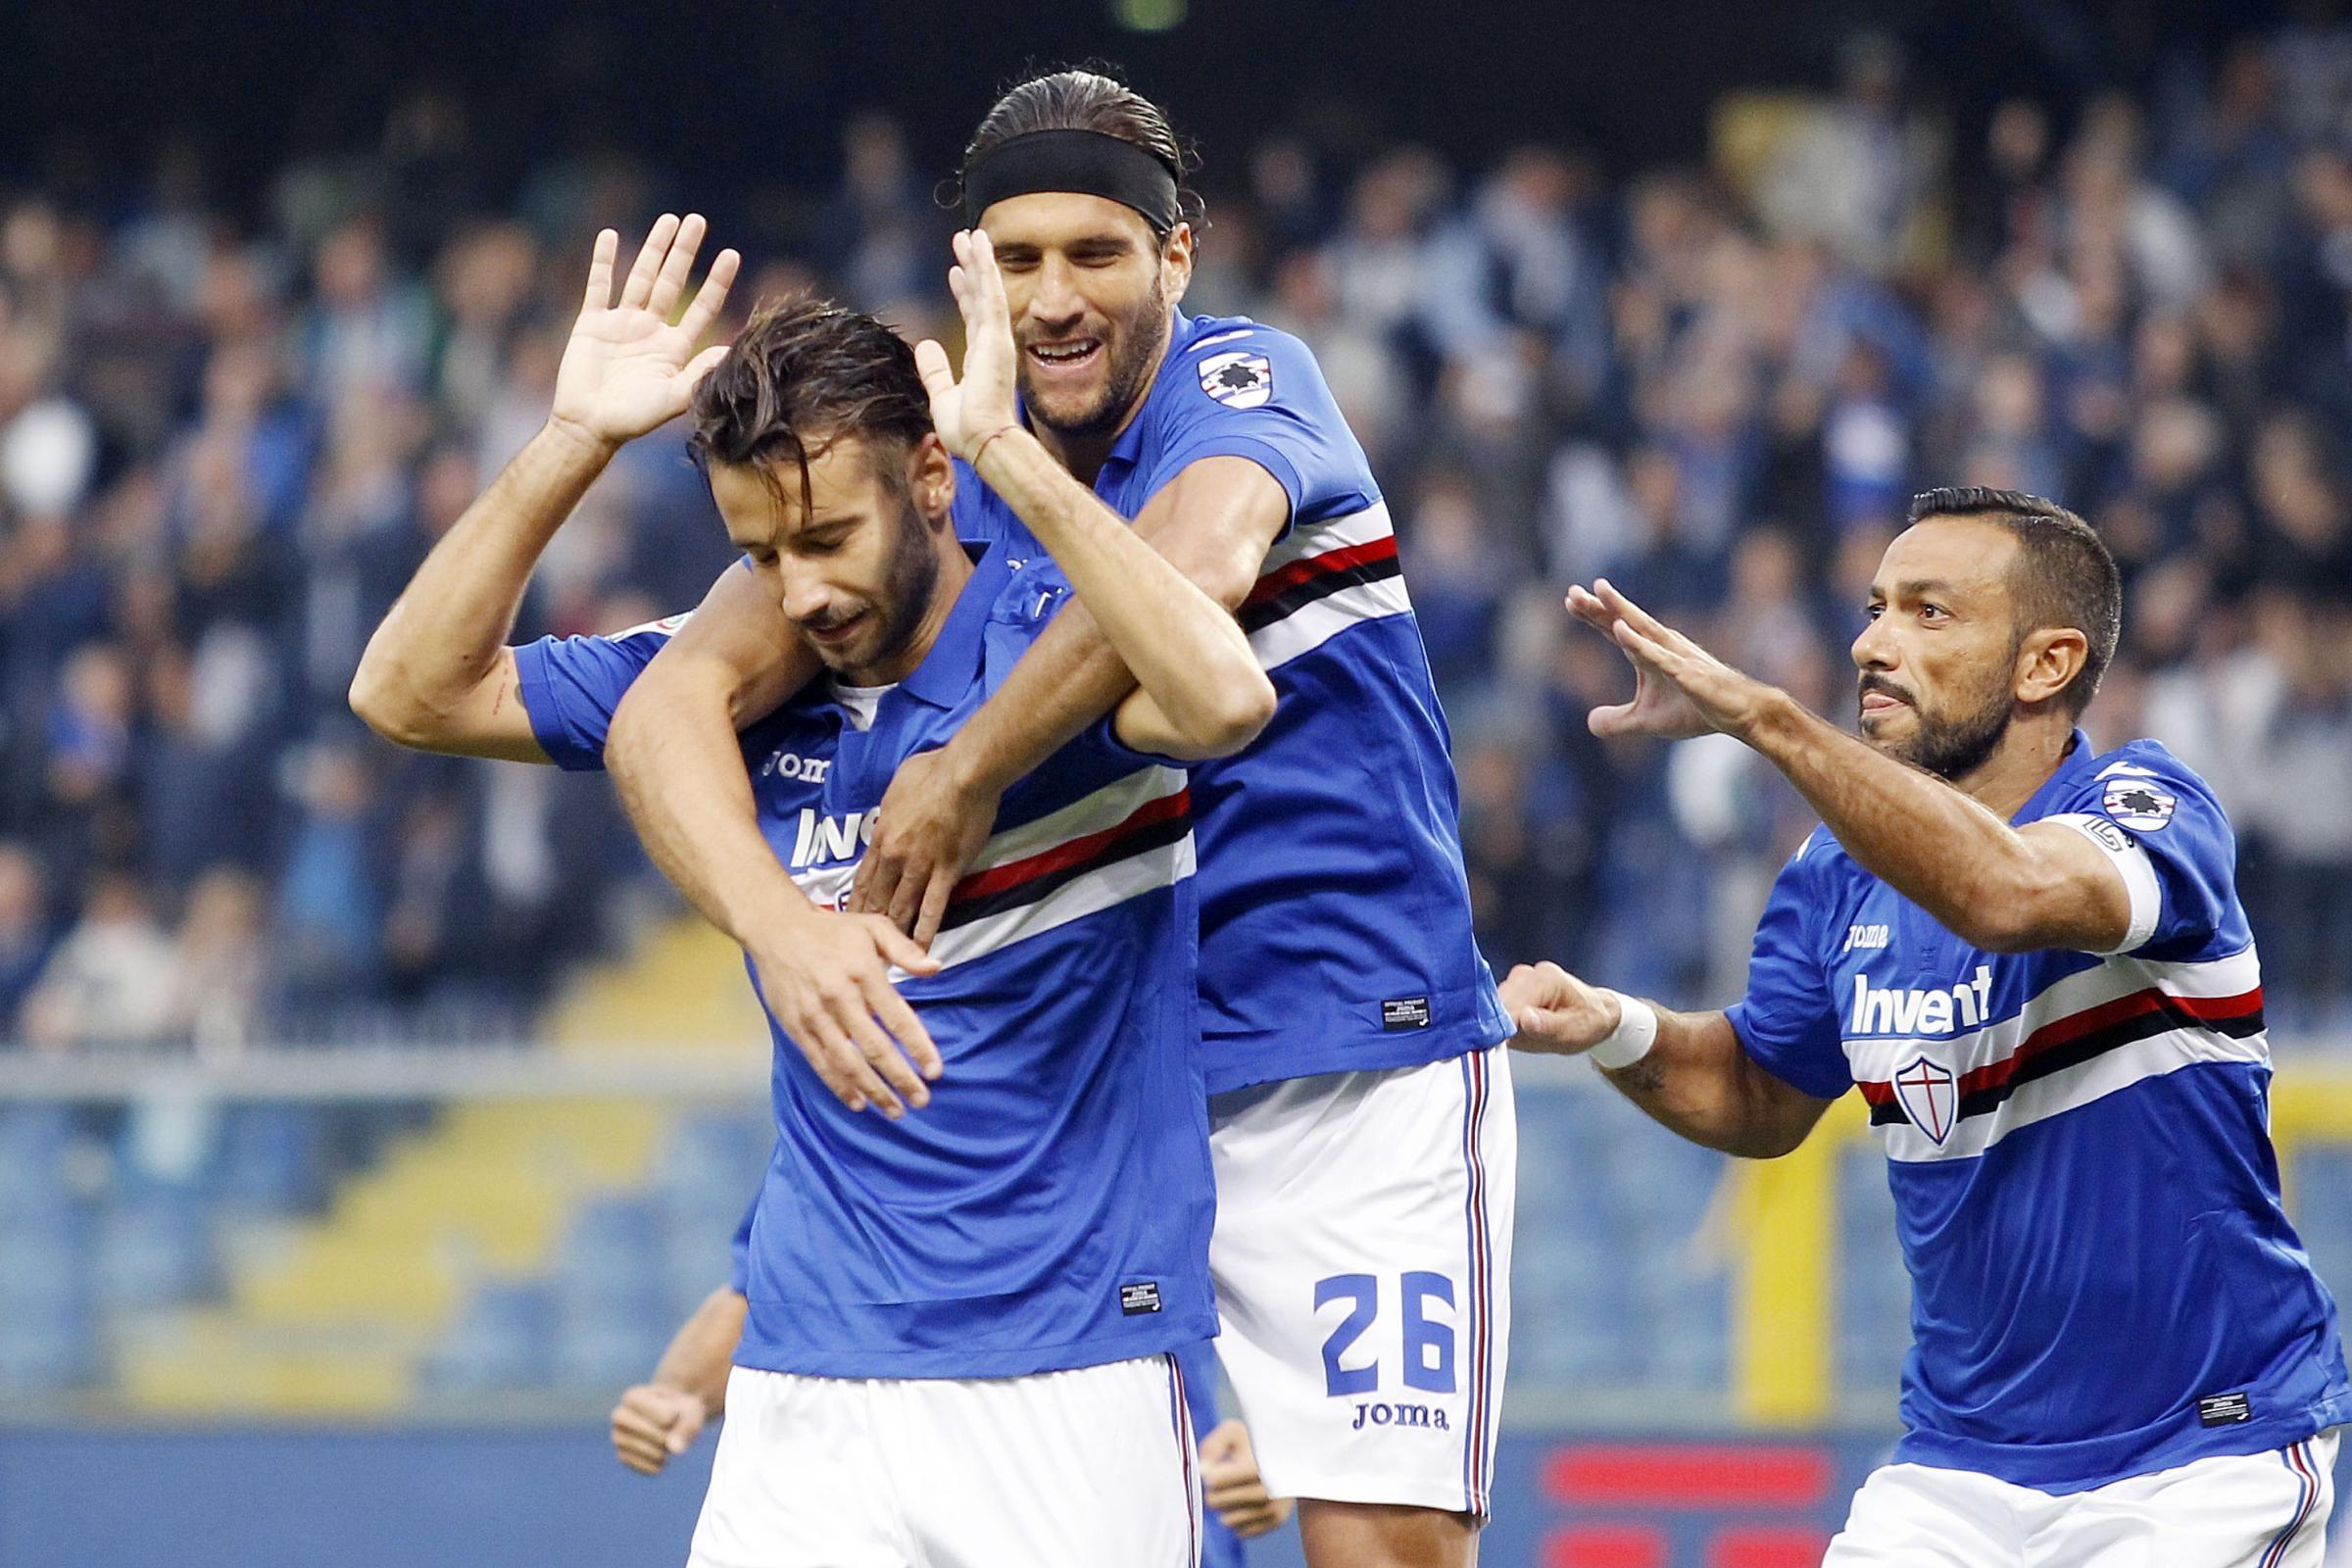 Allenamento calcio Sampdoria Uomo